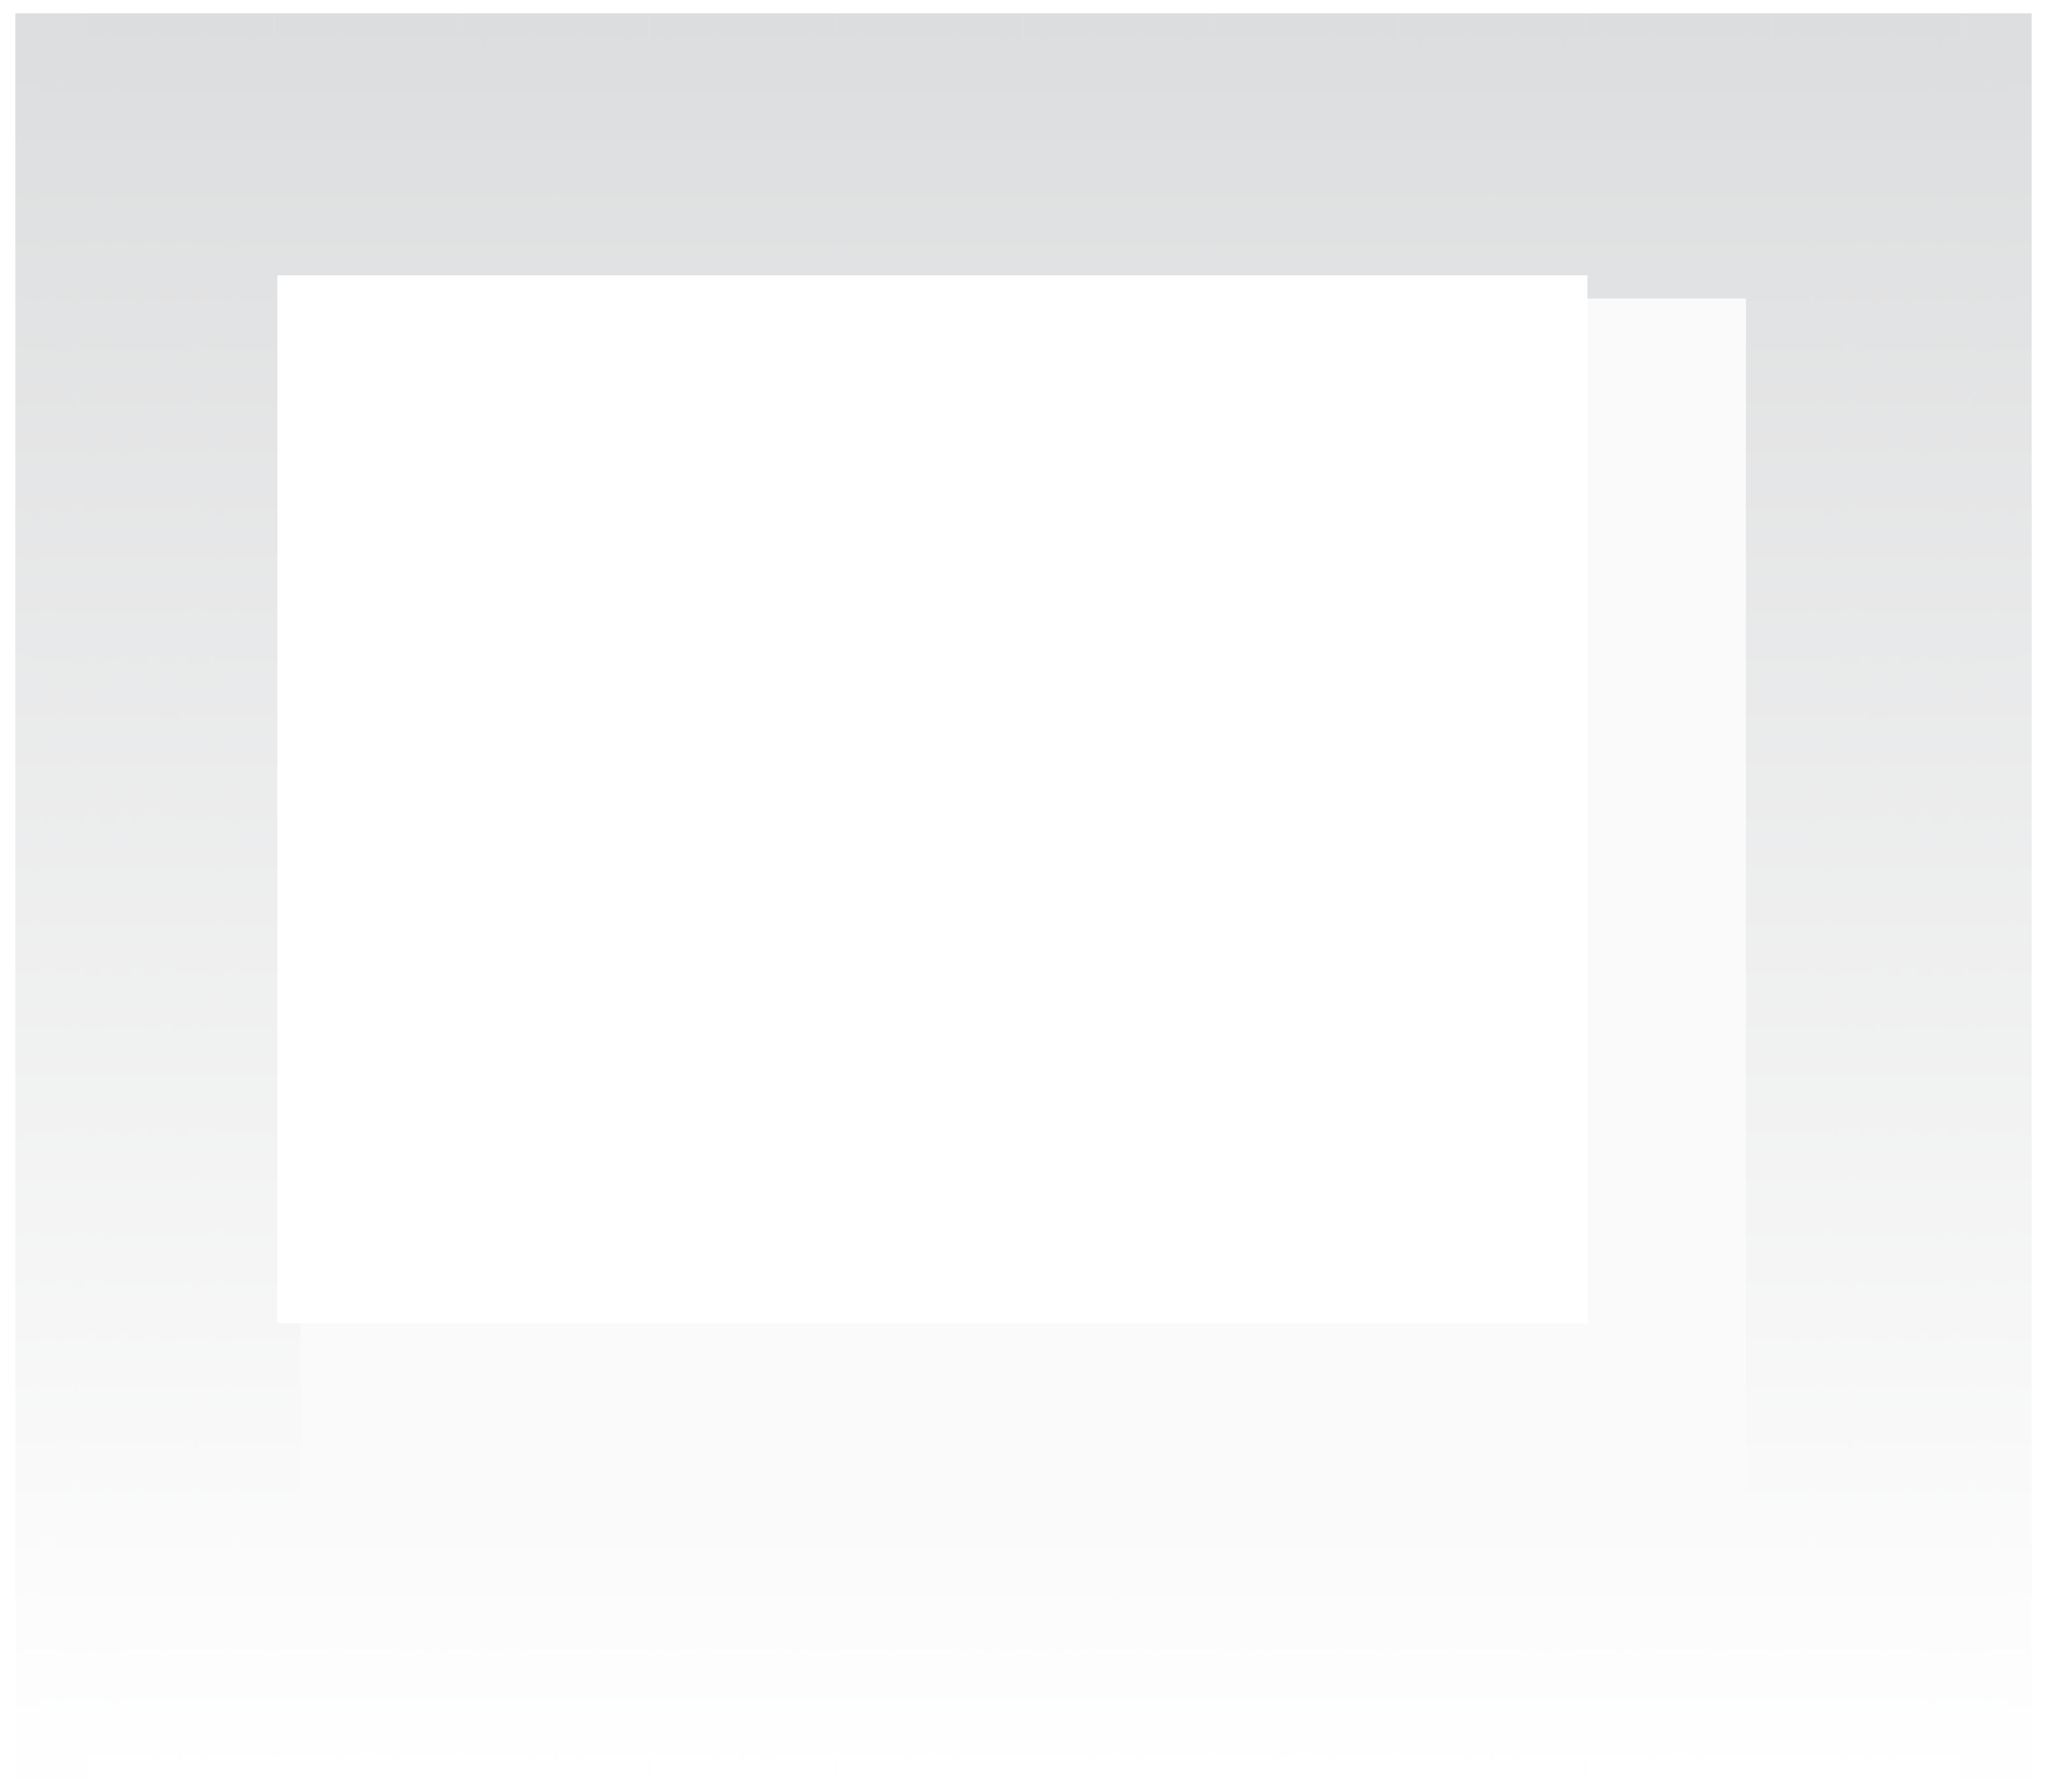 Lace frame clip art. White square border png